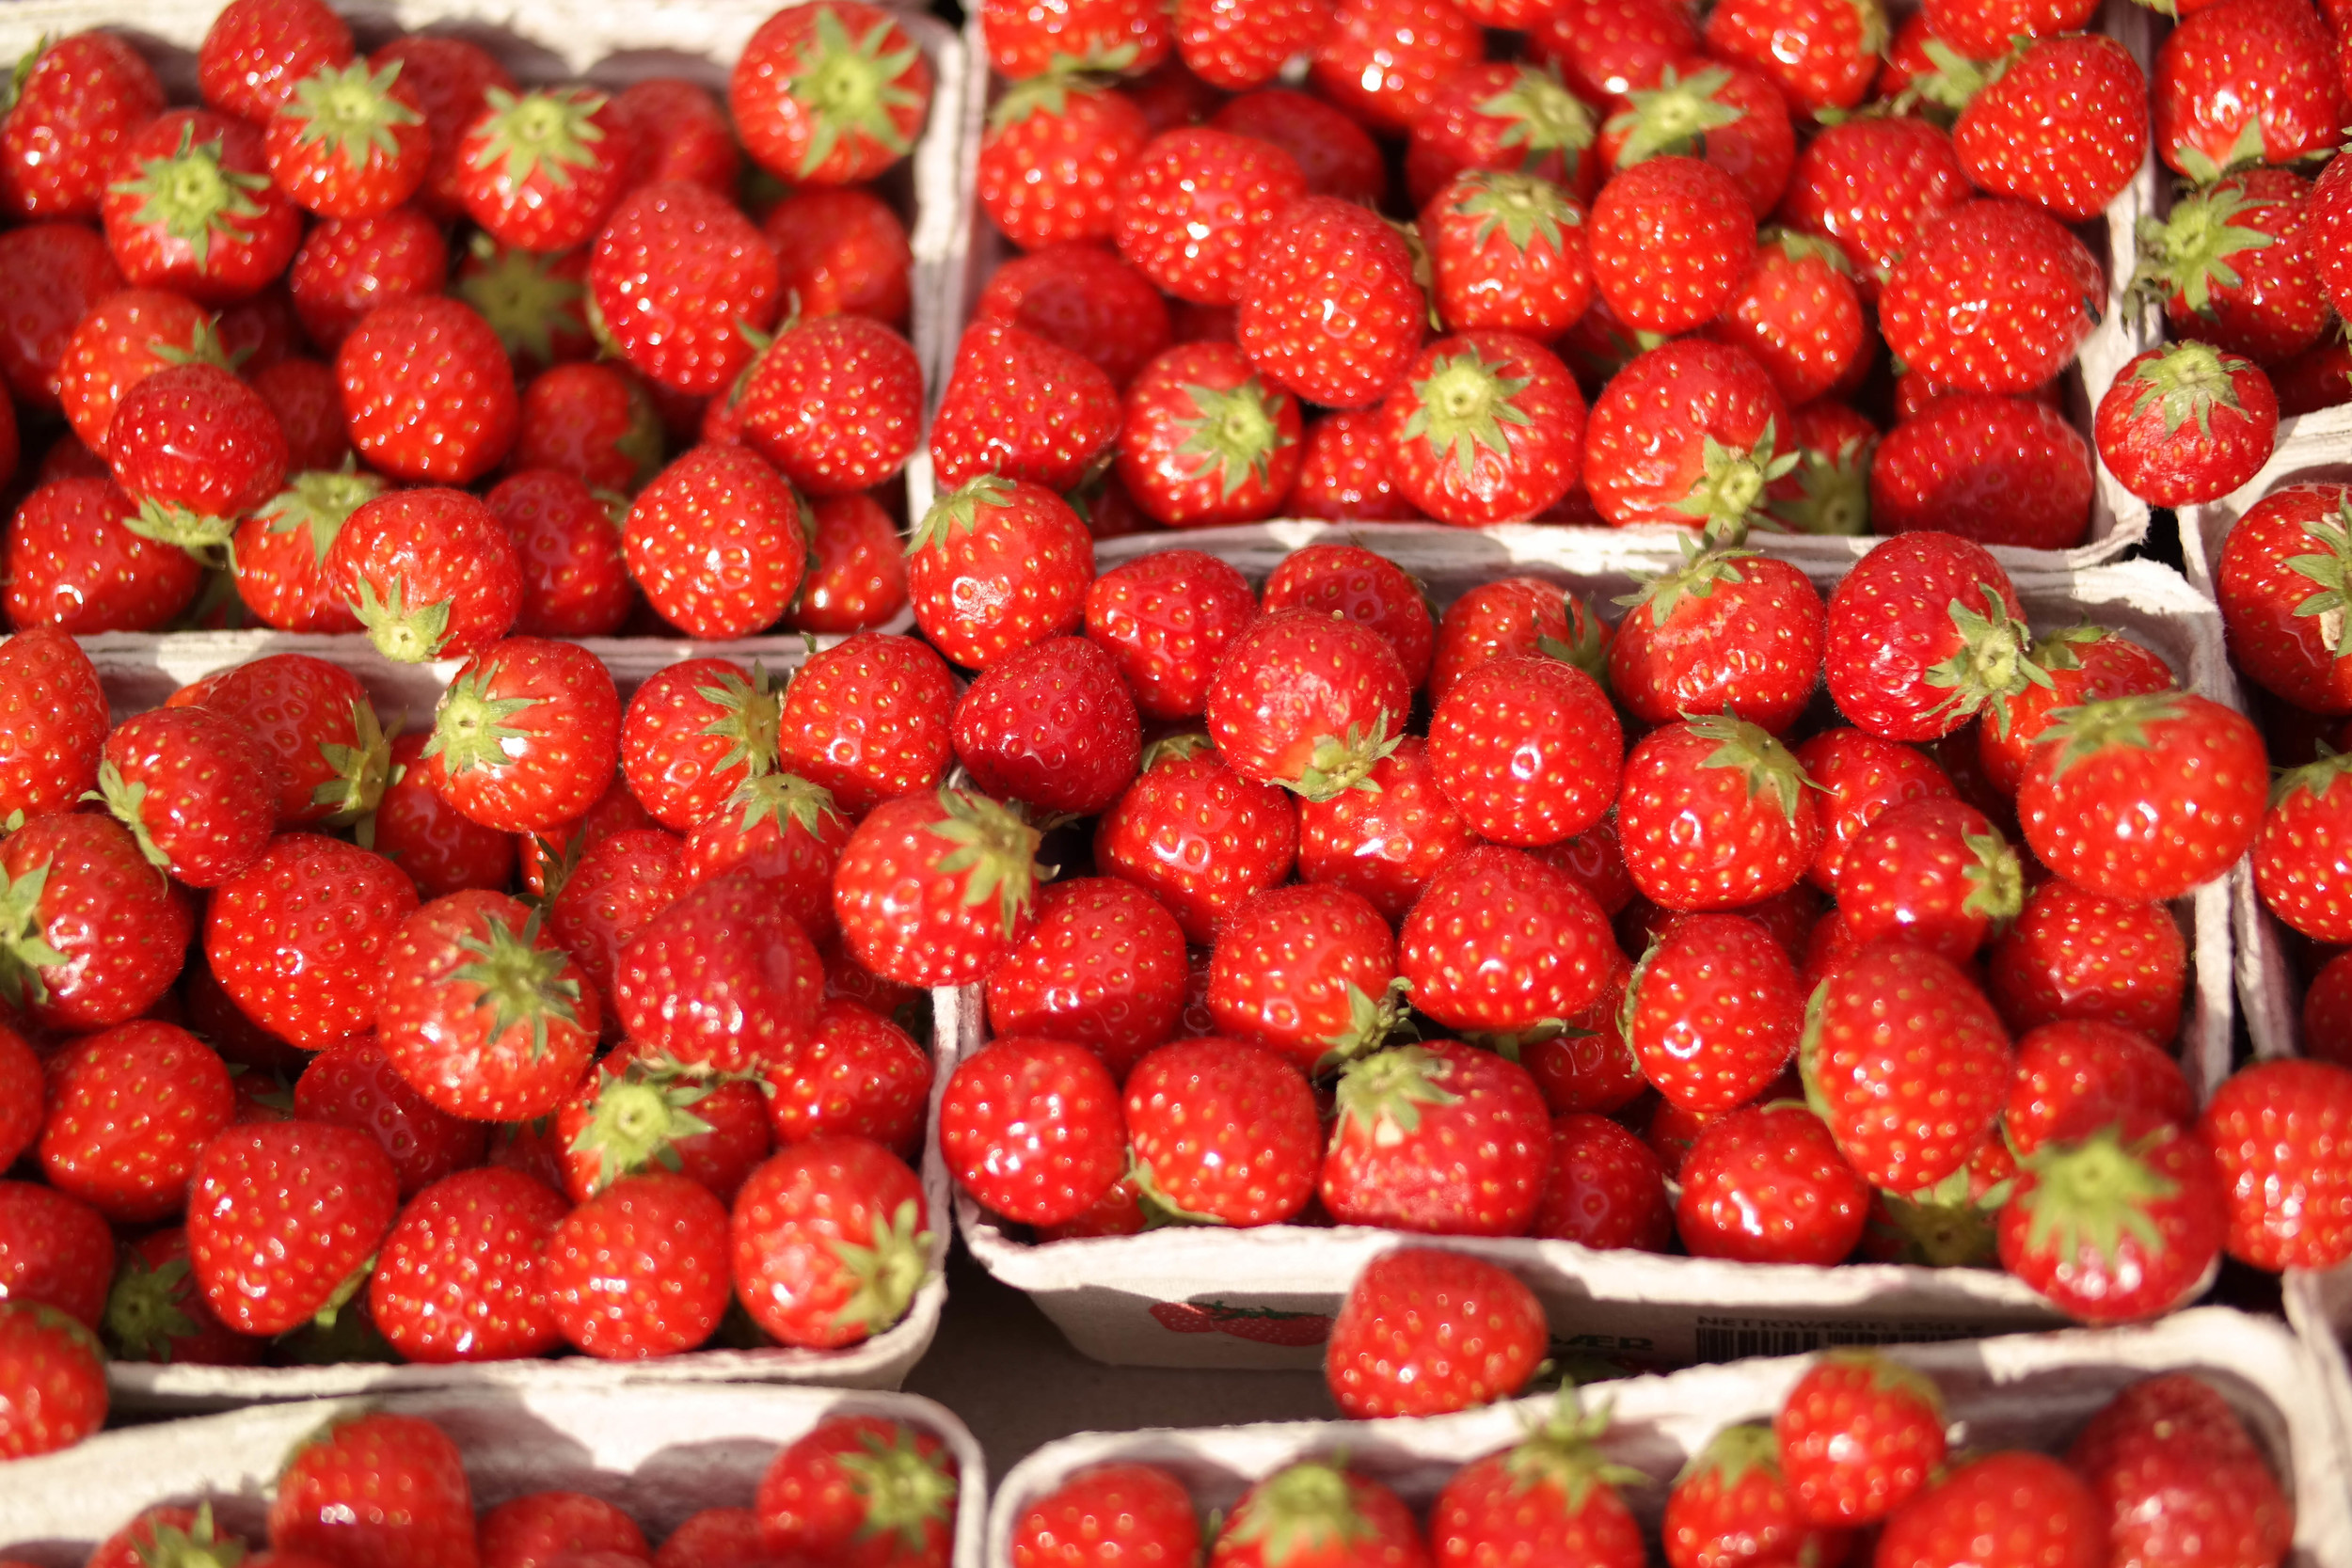 3-Delicious-Strawberry-Maple-Scone | www.8thandlake.com